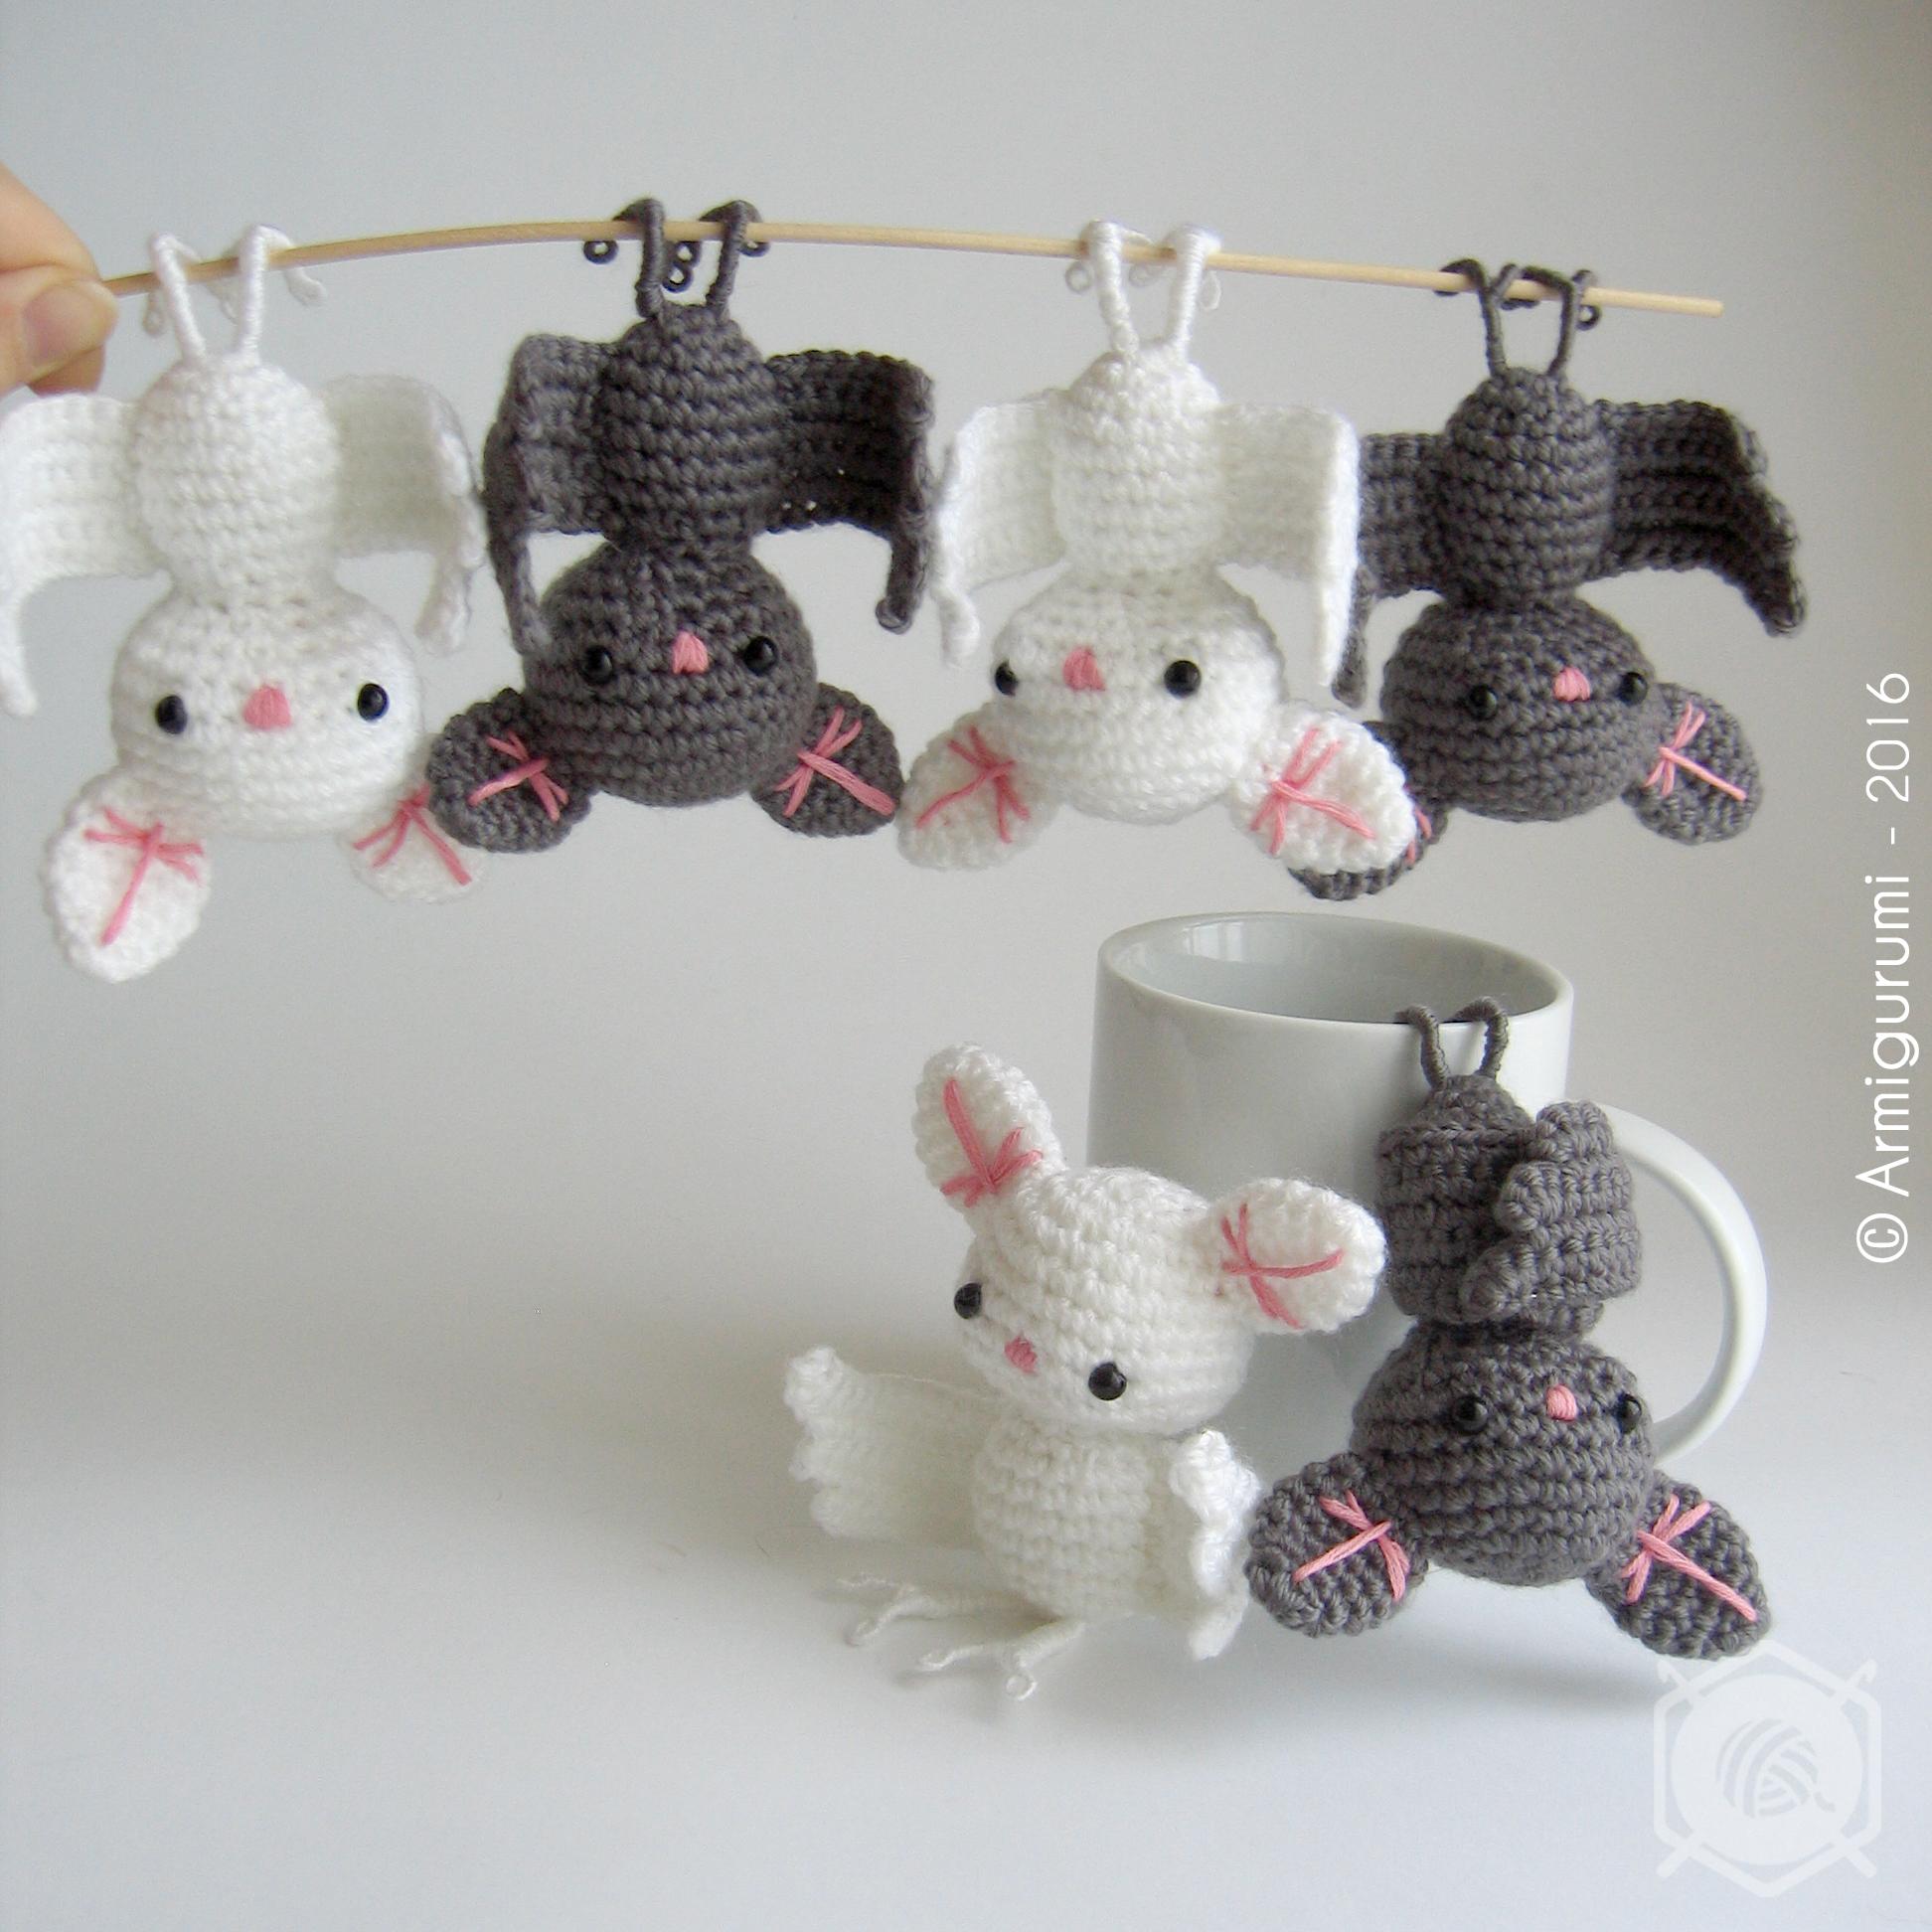 Decorative Little Bats Amigurumi by Armigurumi